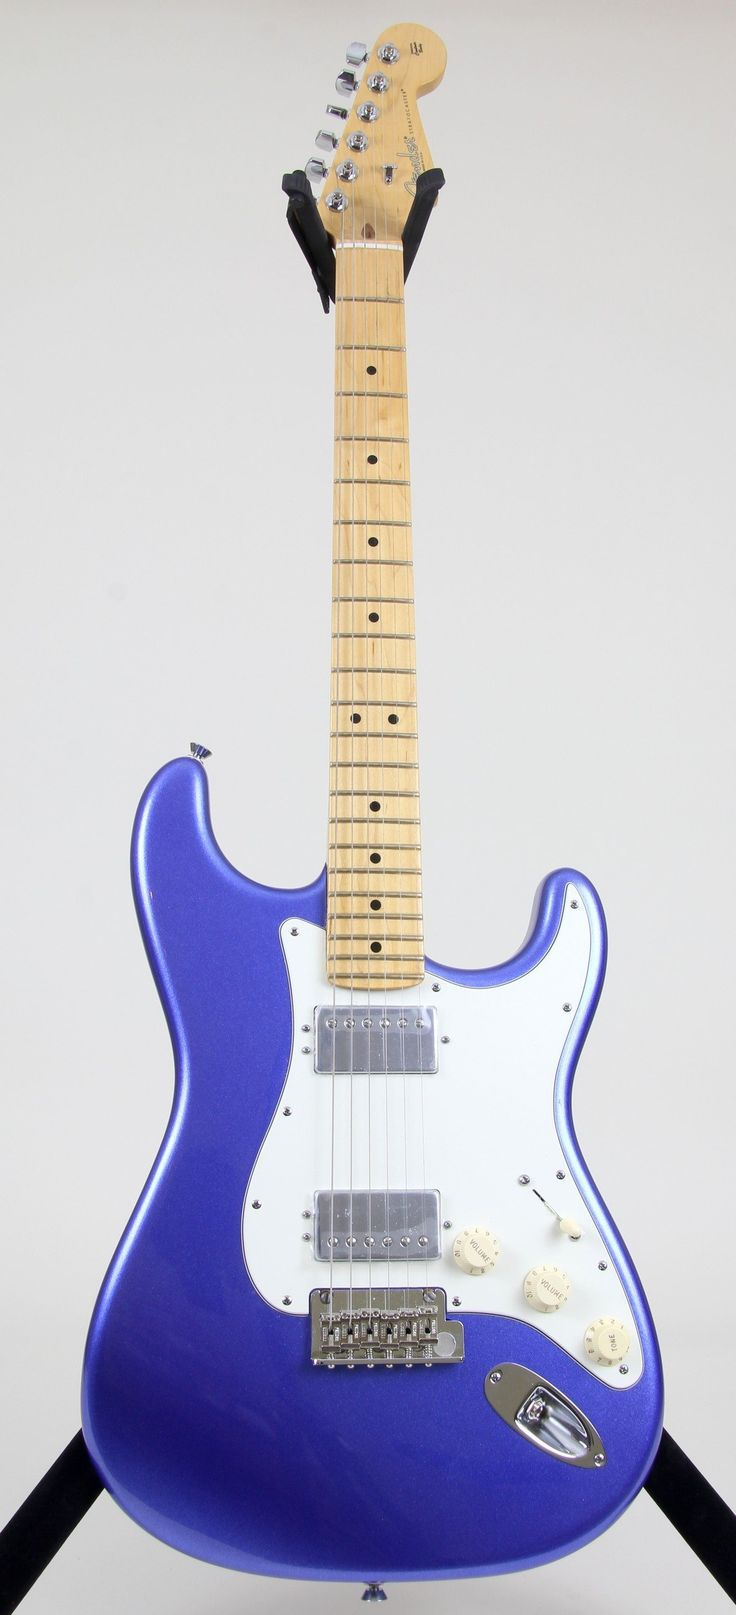 Fender American Standard Stratocaster HH Electric Guitar